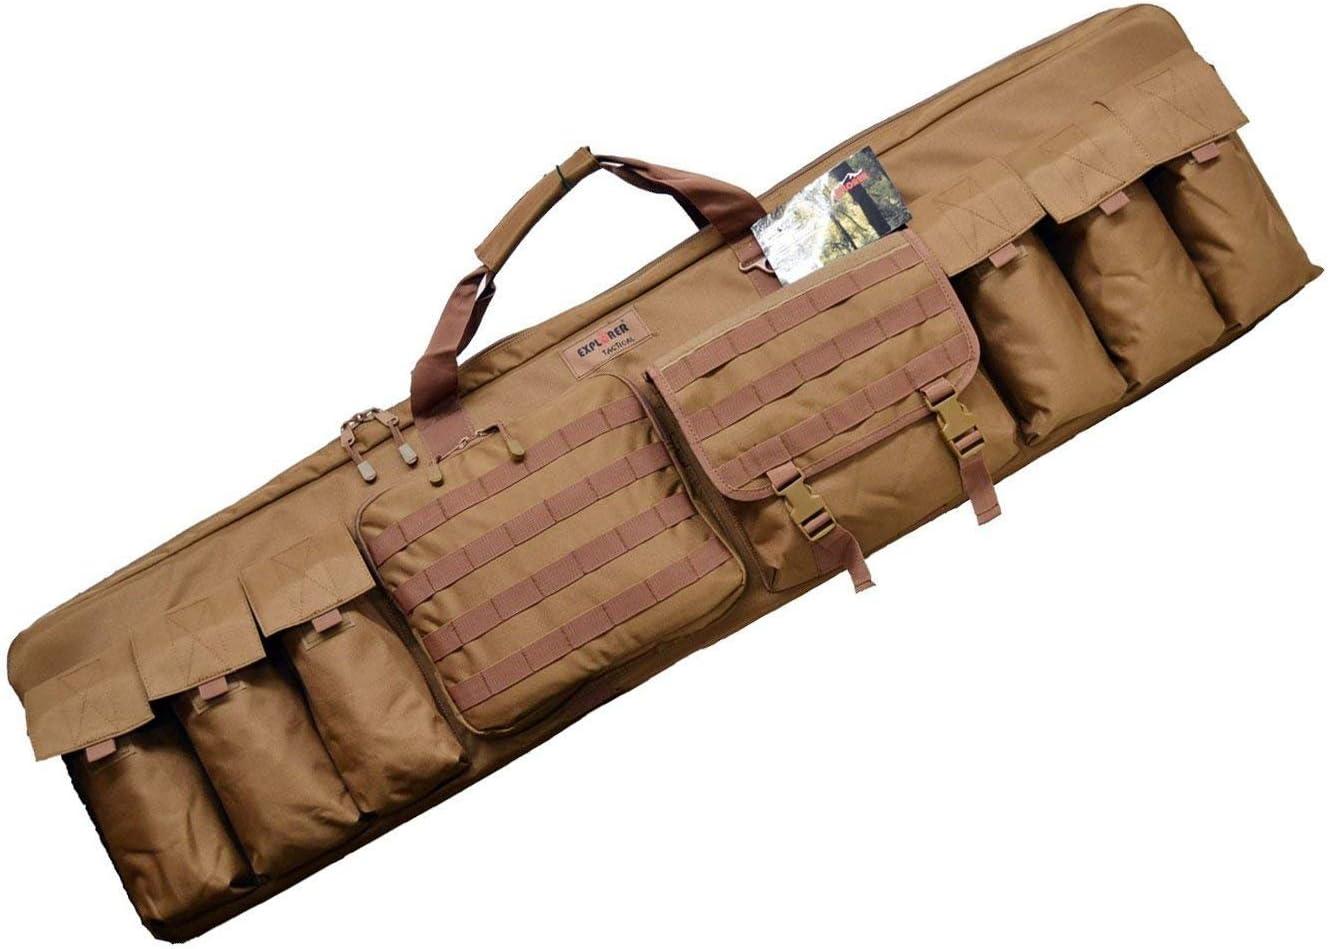 Explorer Ranger Double or 3 Rifles Gun Nippon regular agency Long T Padded Weapon Virginia Beach Mall Case